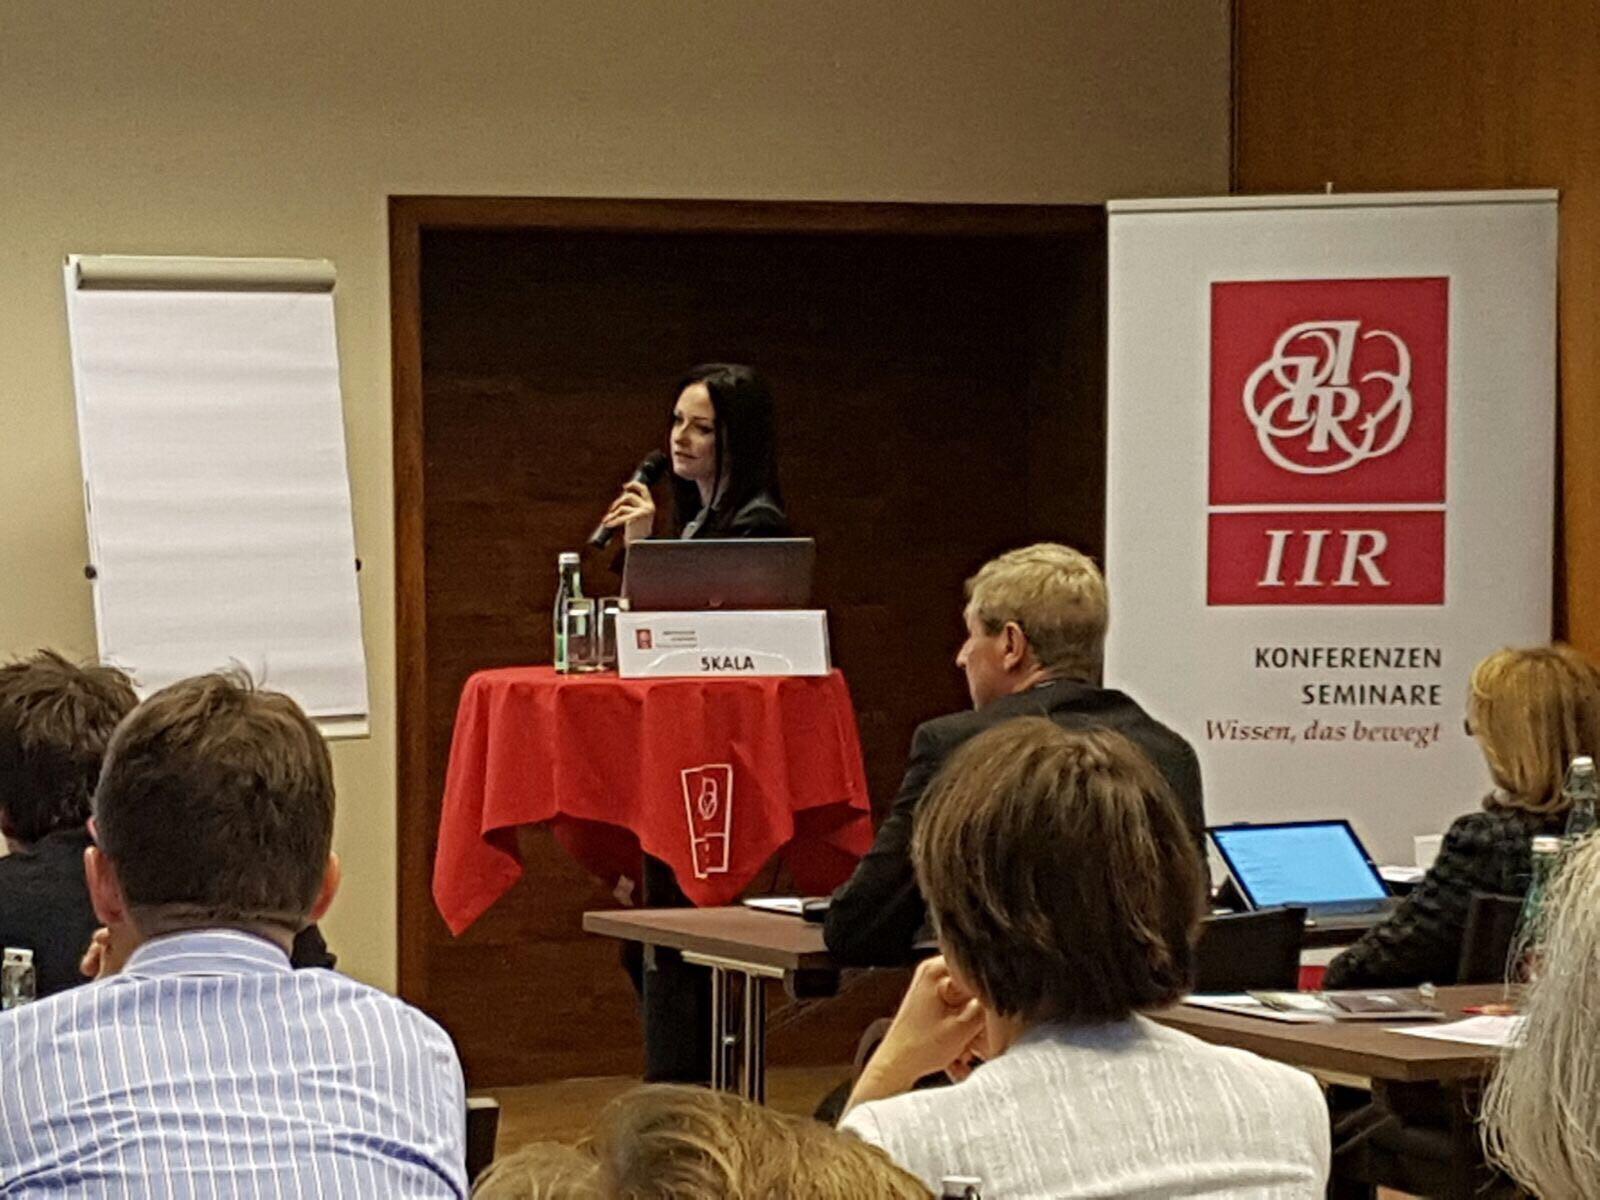 IIR Immobilientage – Konferenz Hotelimmobilie